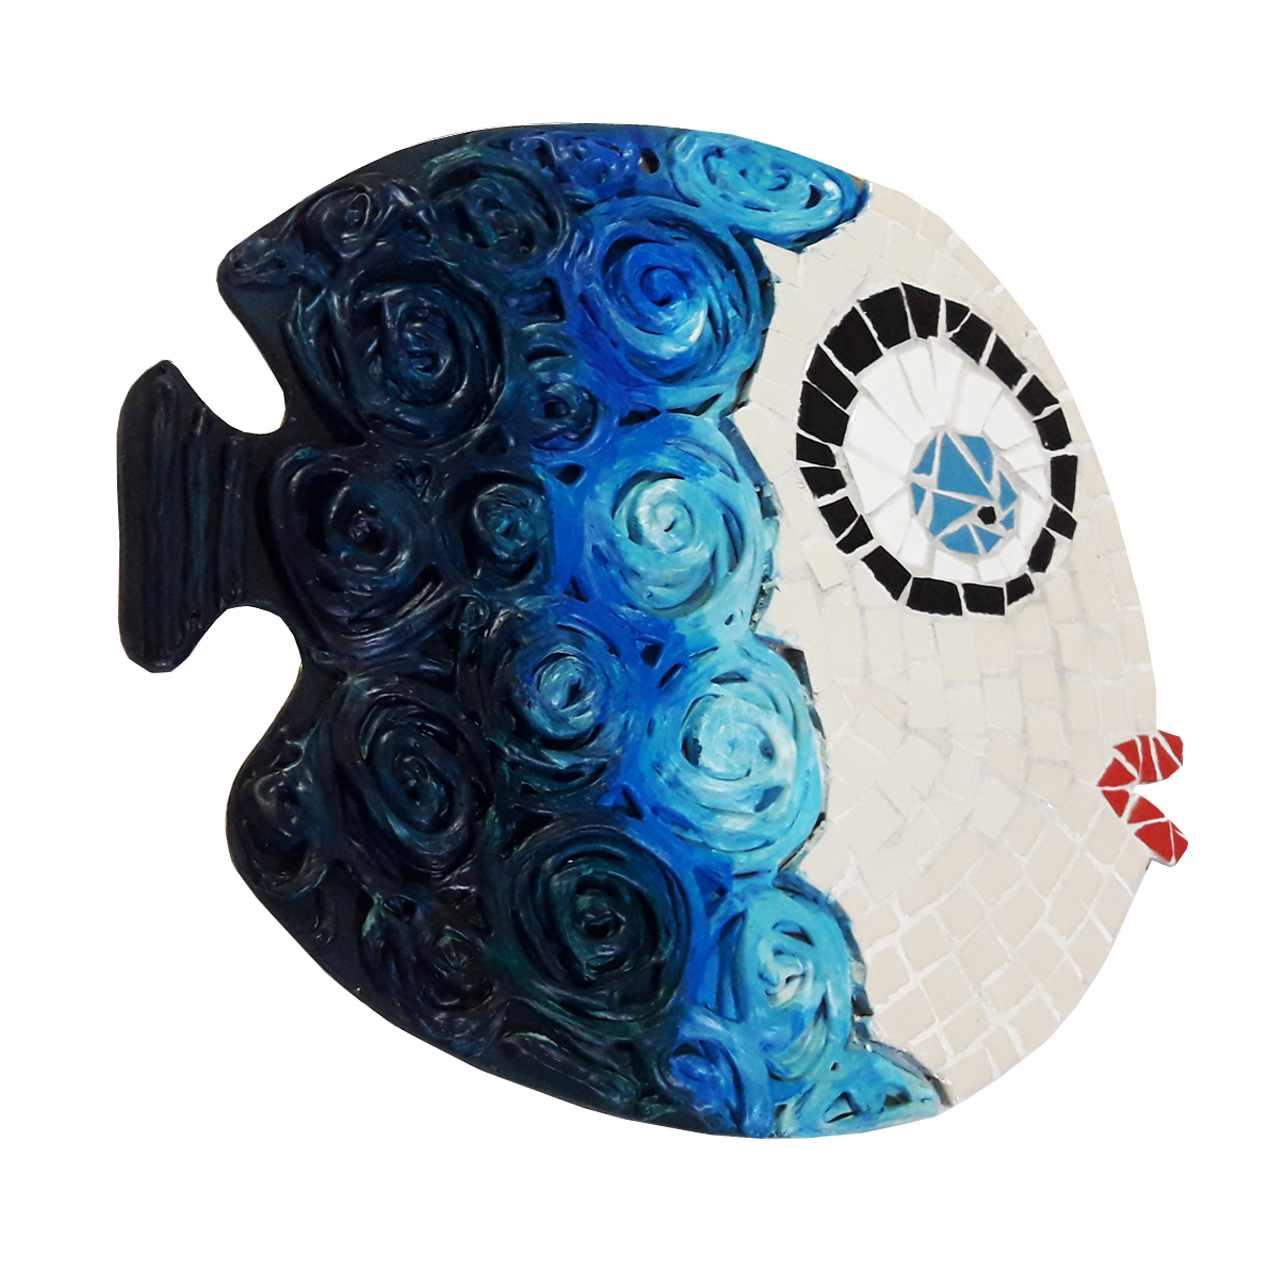 خرید                      تابلو کاشی کاری طرح ماهی کد MA-2-02